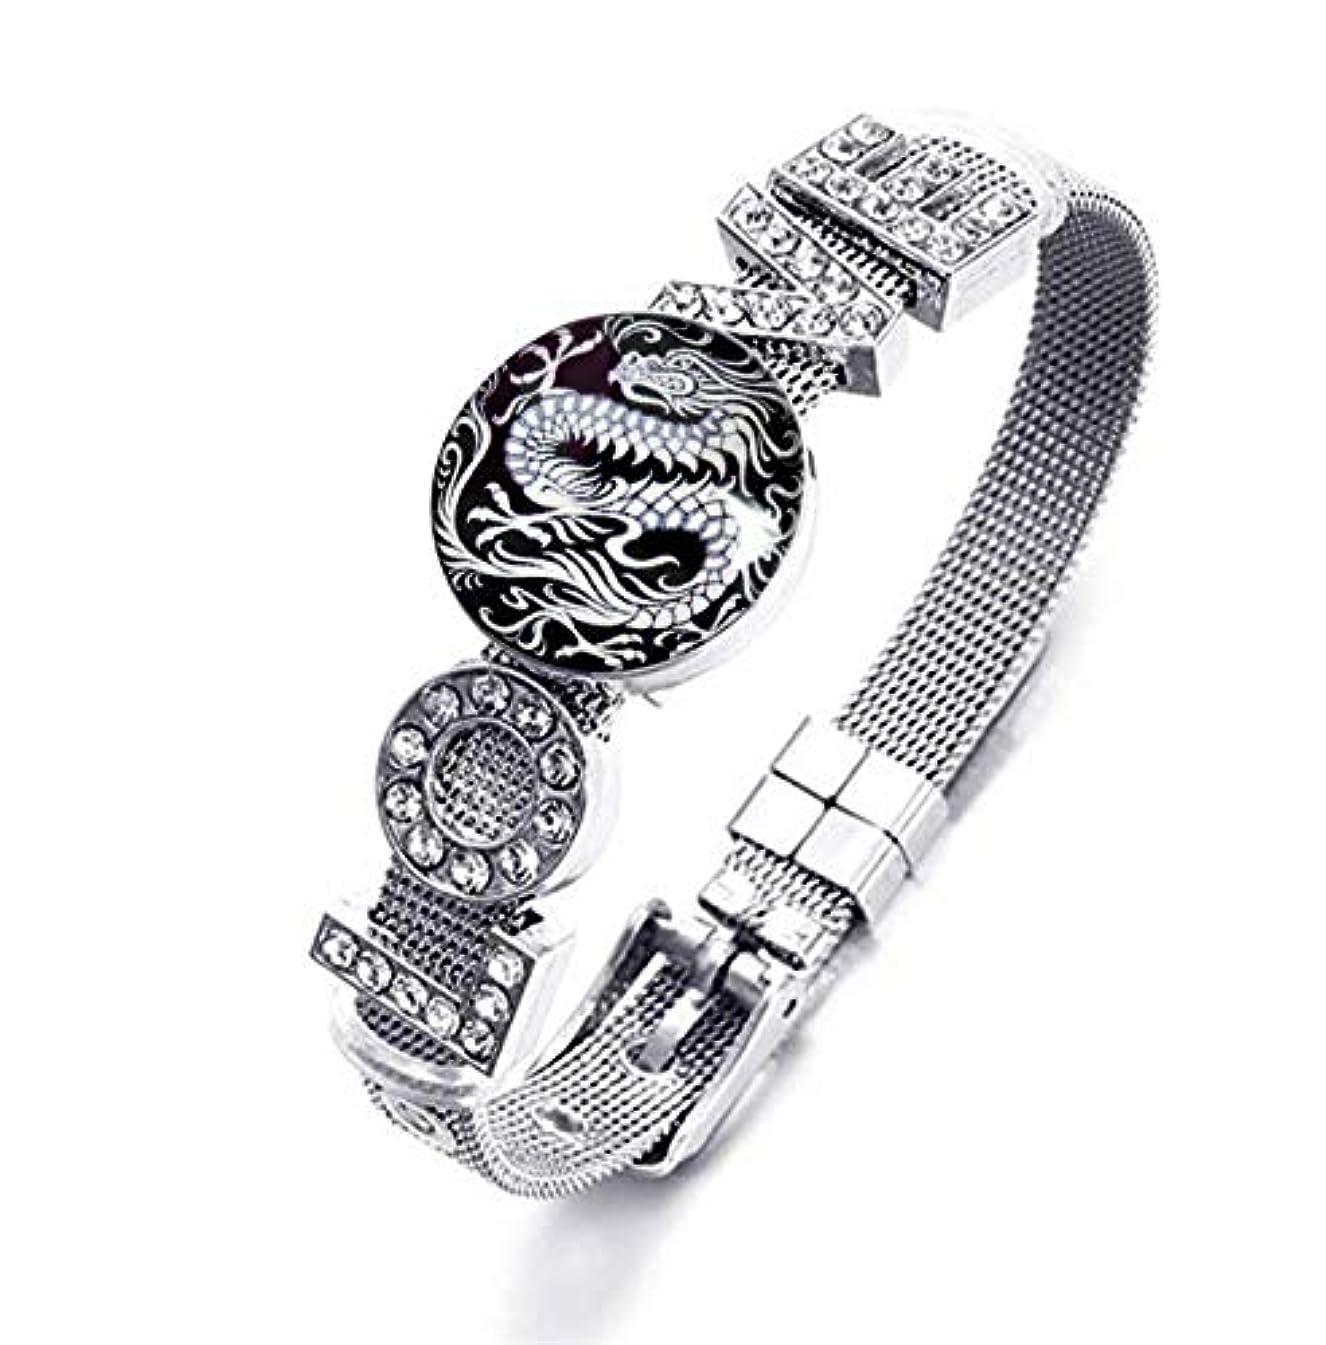 XuSuJuan Photo Custom Snap Rhinestone Crystal Love Bracelet DIY Glass Snap Noosa Ginger Charms (Chinese Dragon Asian Oriental Black White STASH)